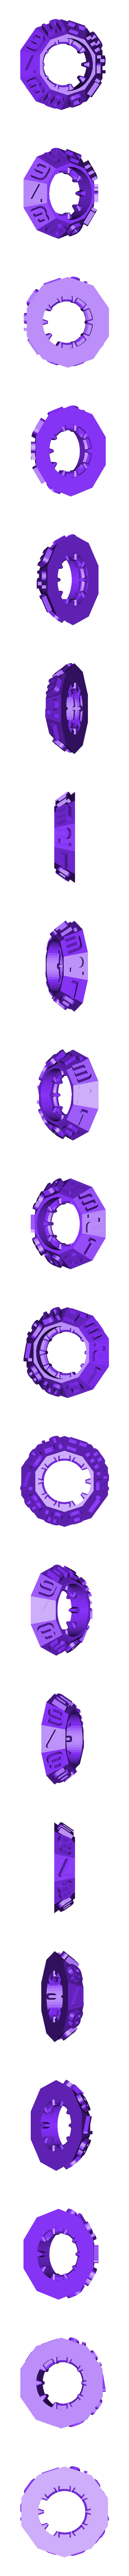 6R-7L.stl Download free STL file Latch Cryptex - Cerrojo • 3D printable design, xutano